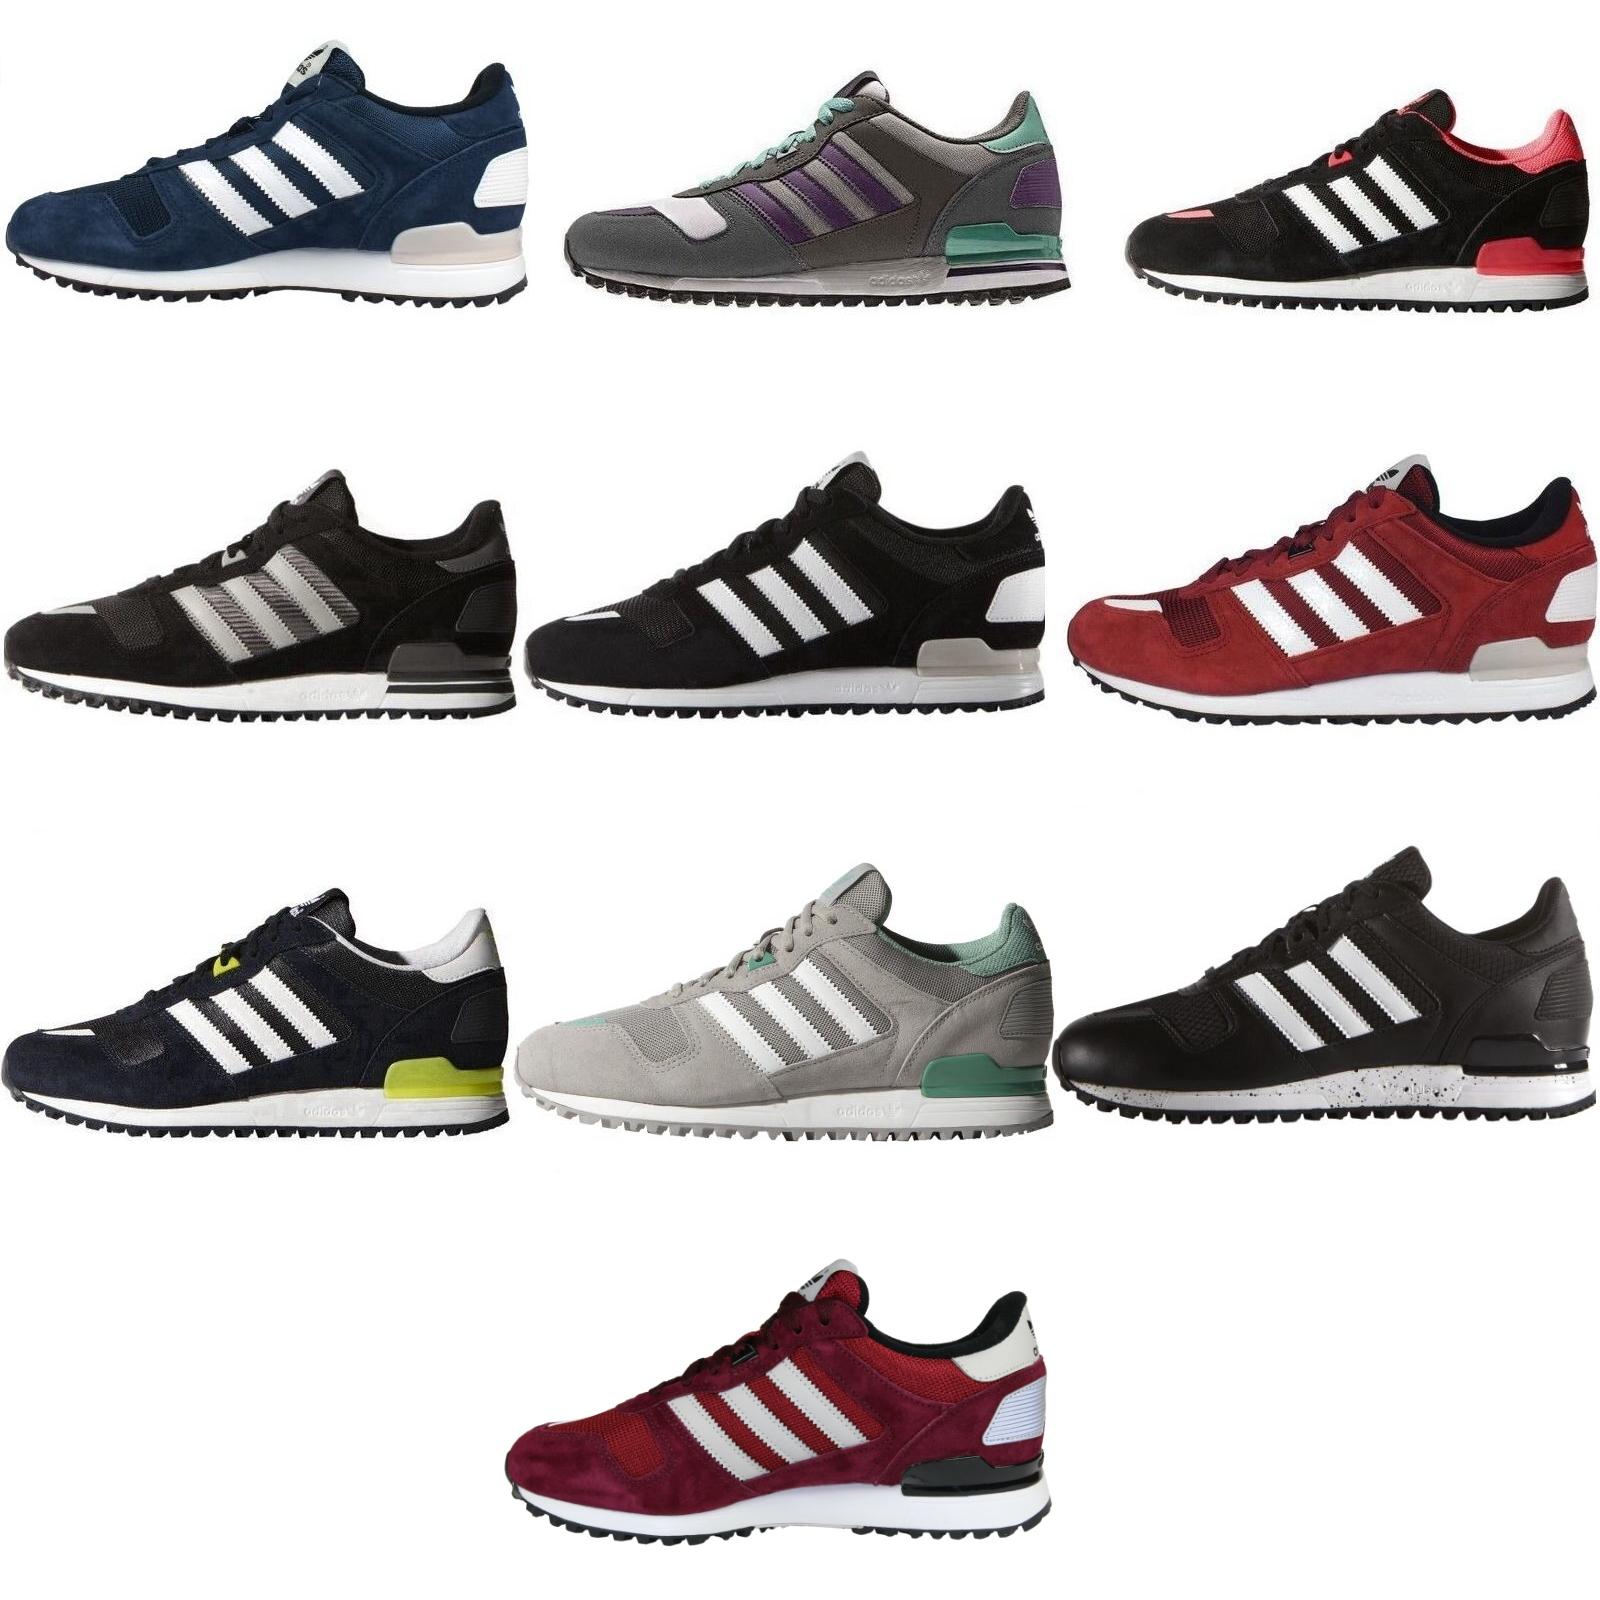 Adidas Originals Spezial Sneaker Herren Dunkelblau-blau